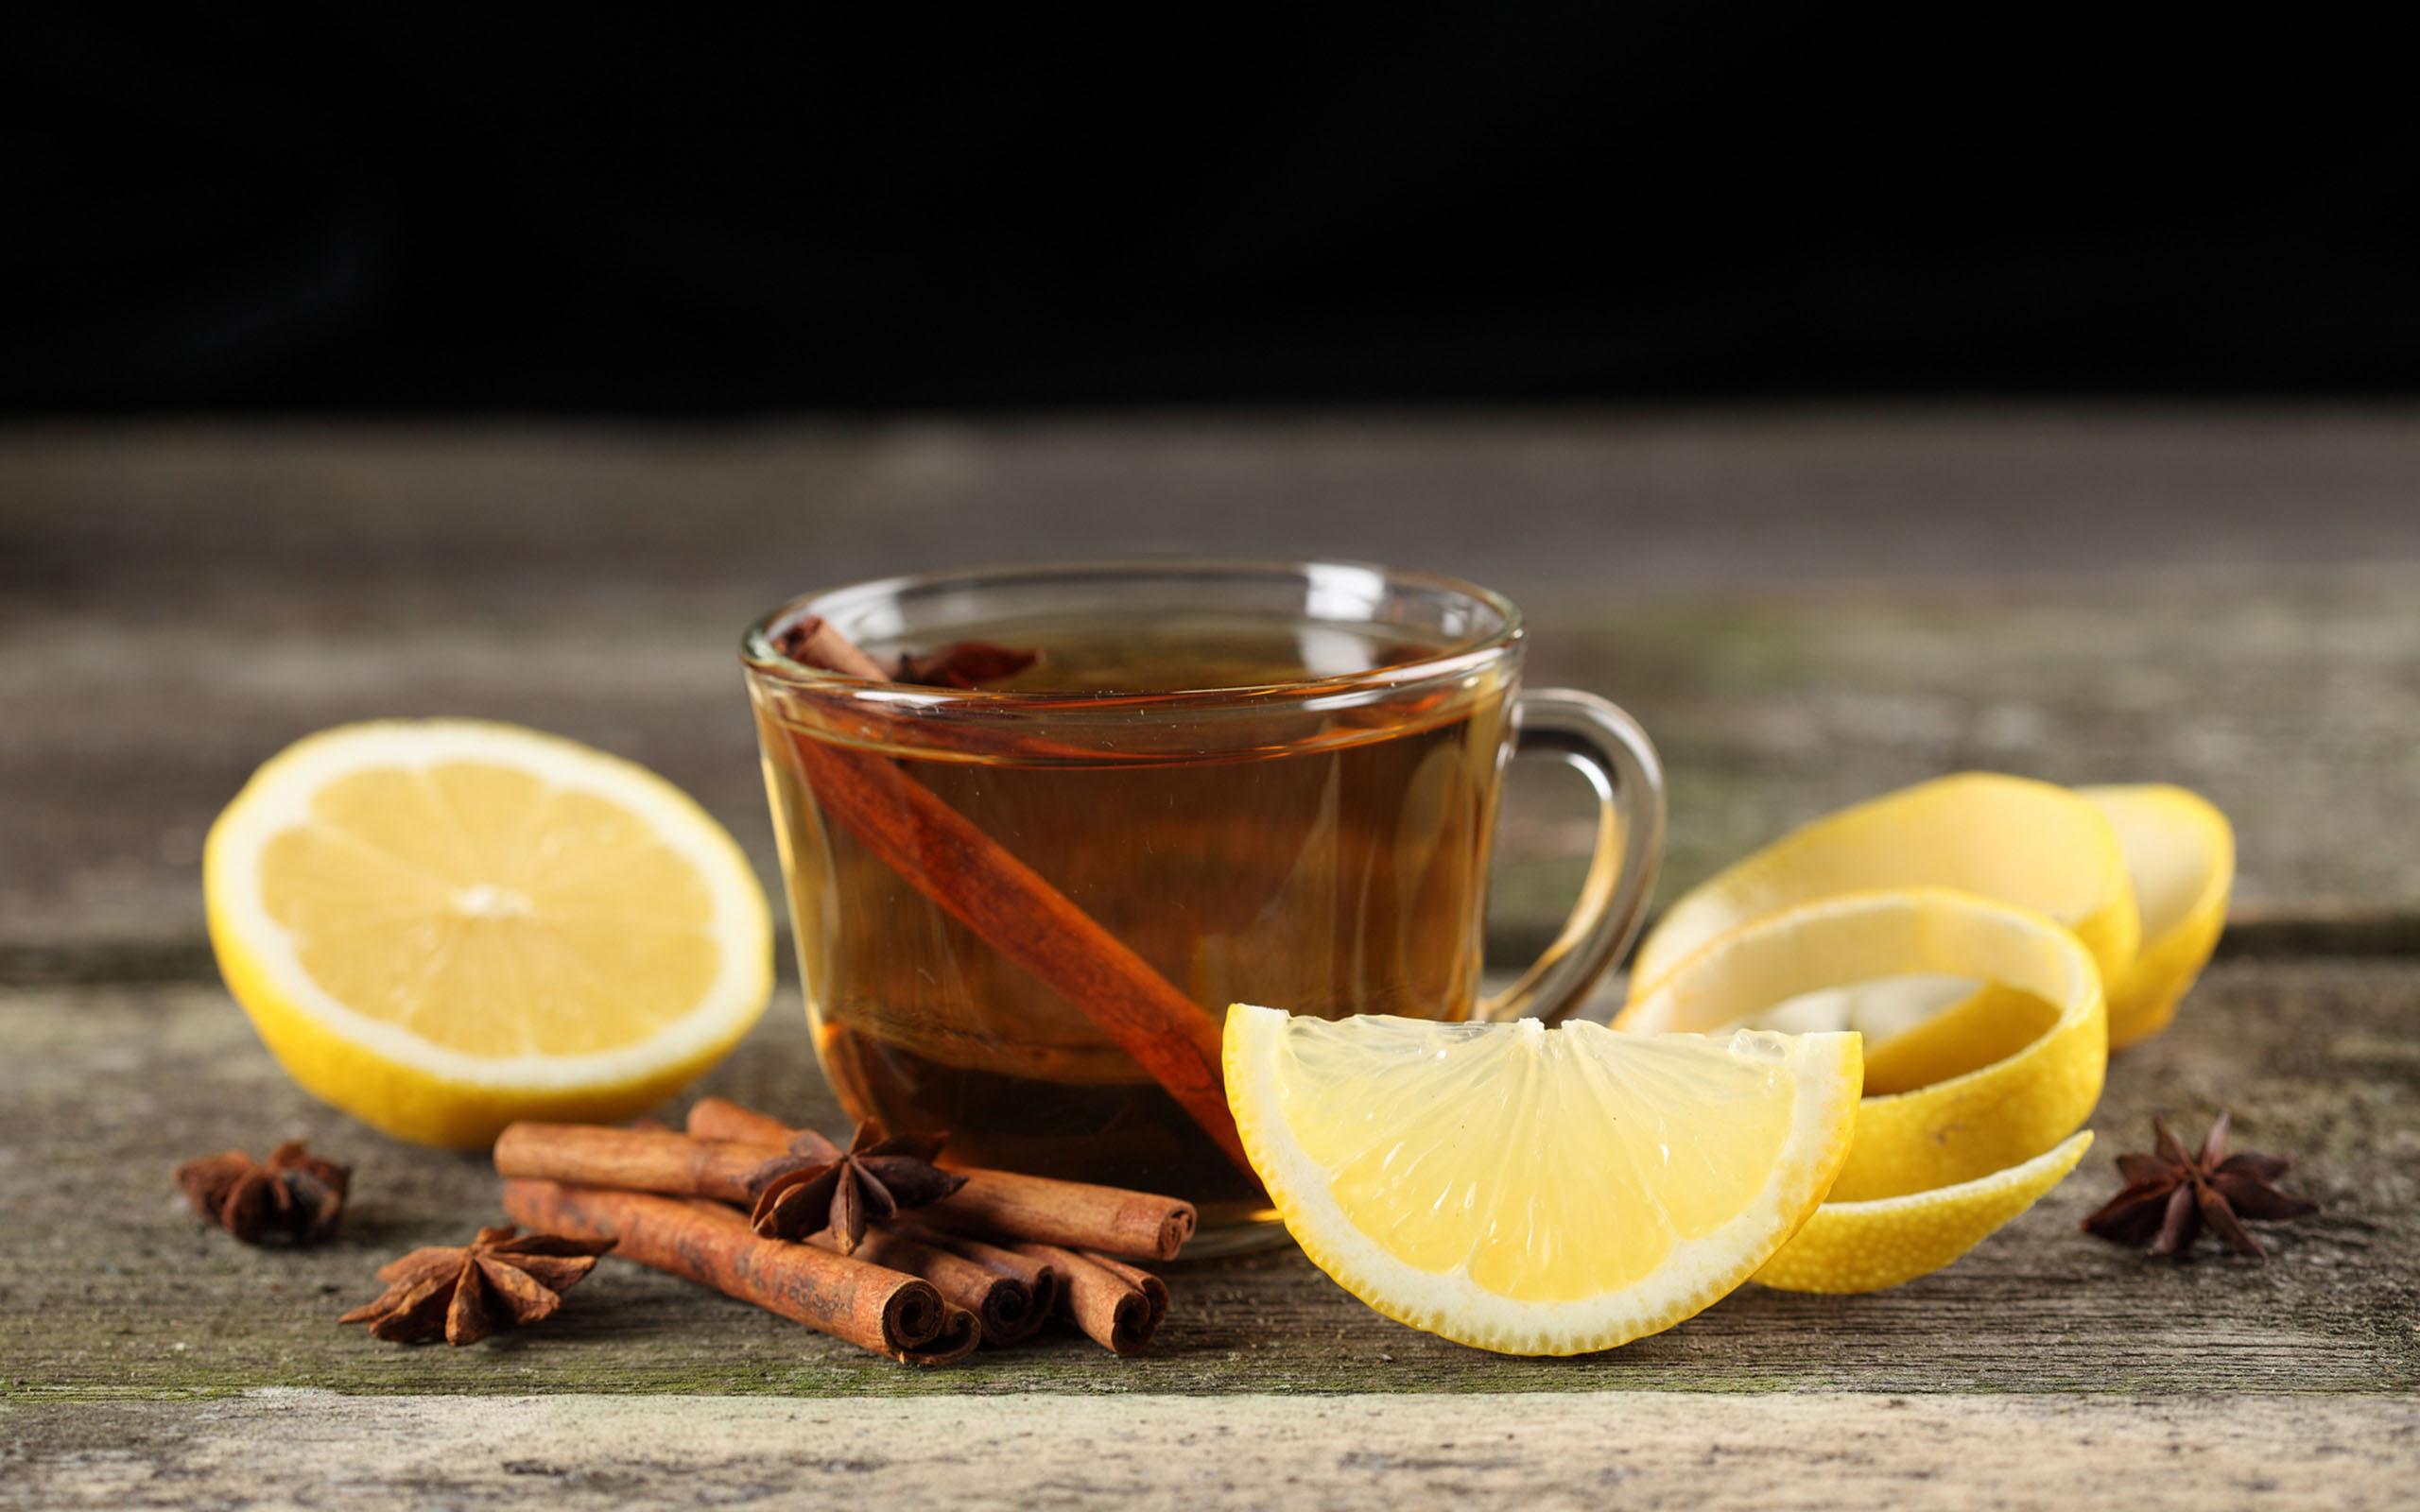 Cute Coffee Mug Wallpaper Hot Tea With Lemon And Cinnamon Winter Drink